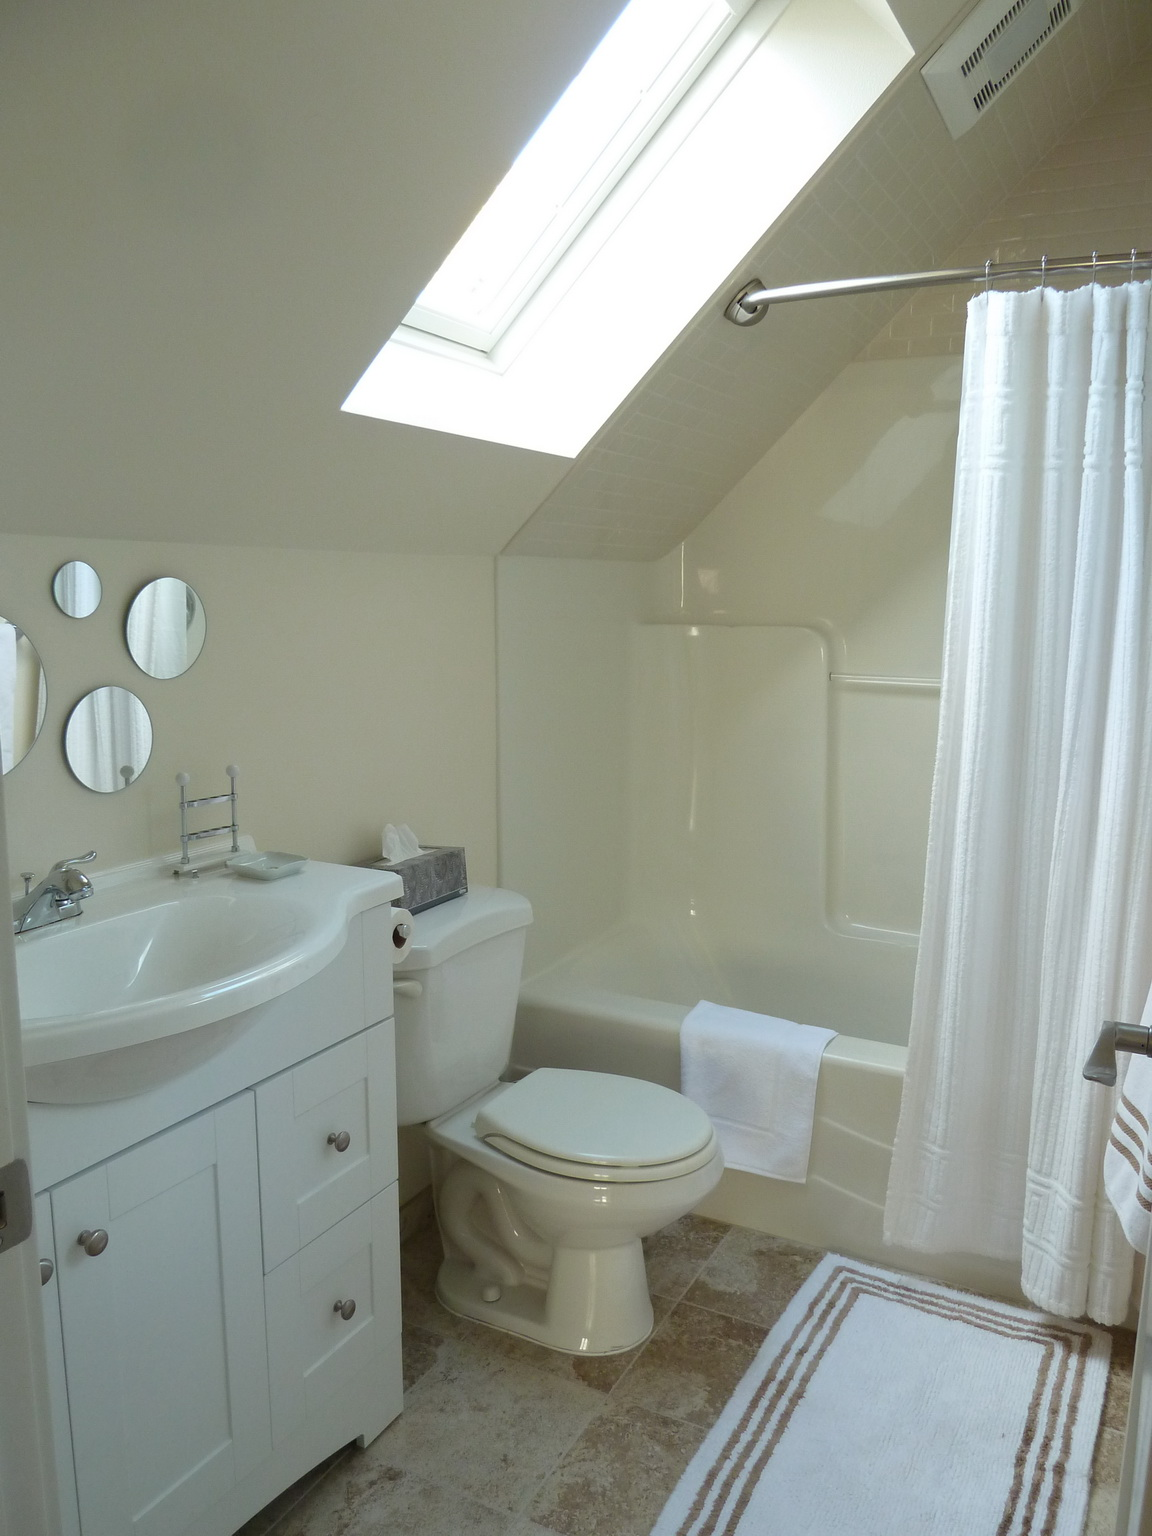 206 NW 8th Street, Corvallis, Oregon-Carriage House Full Bath